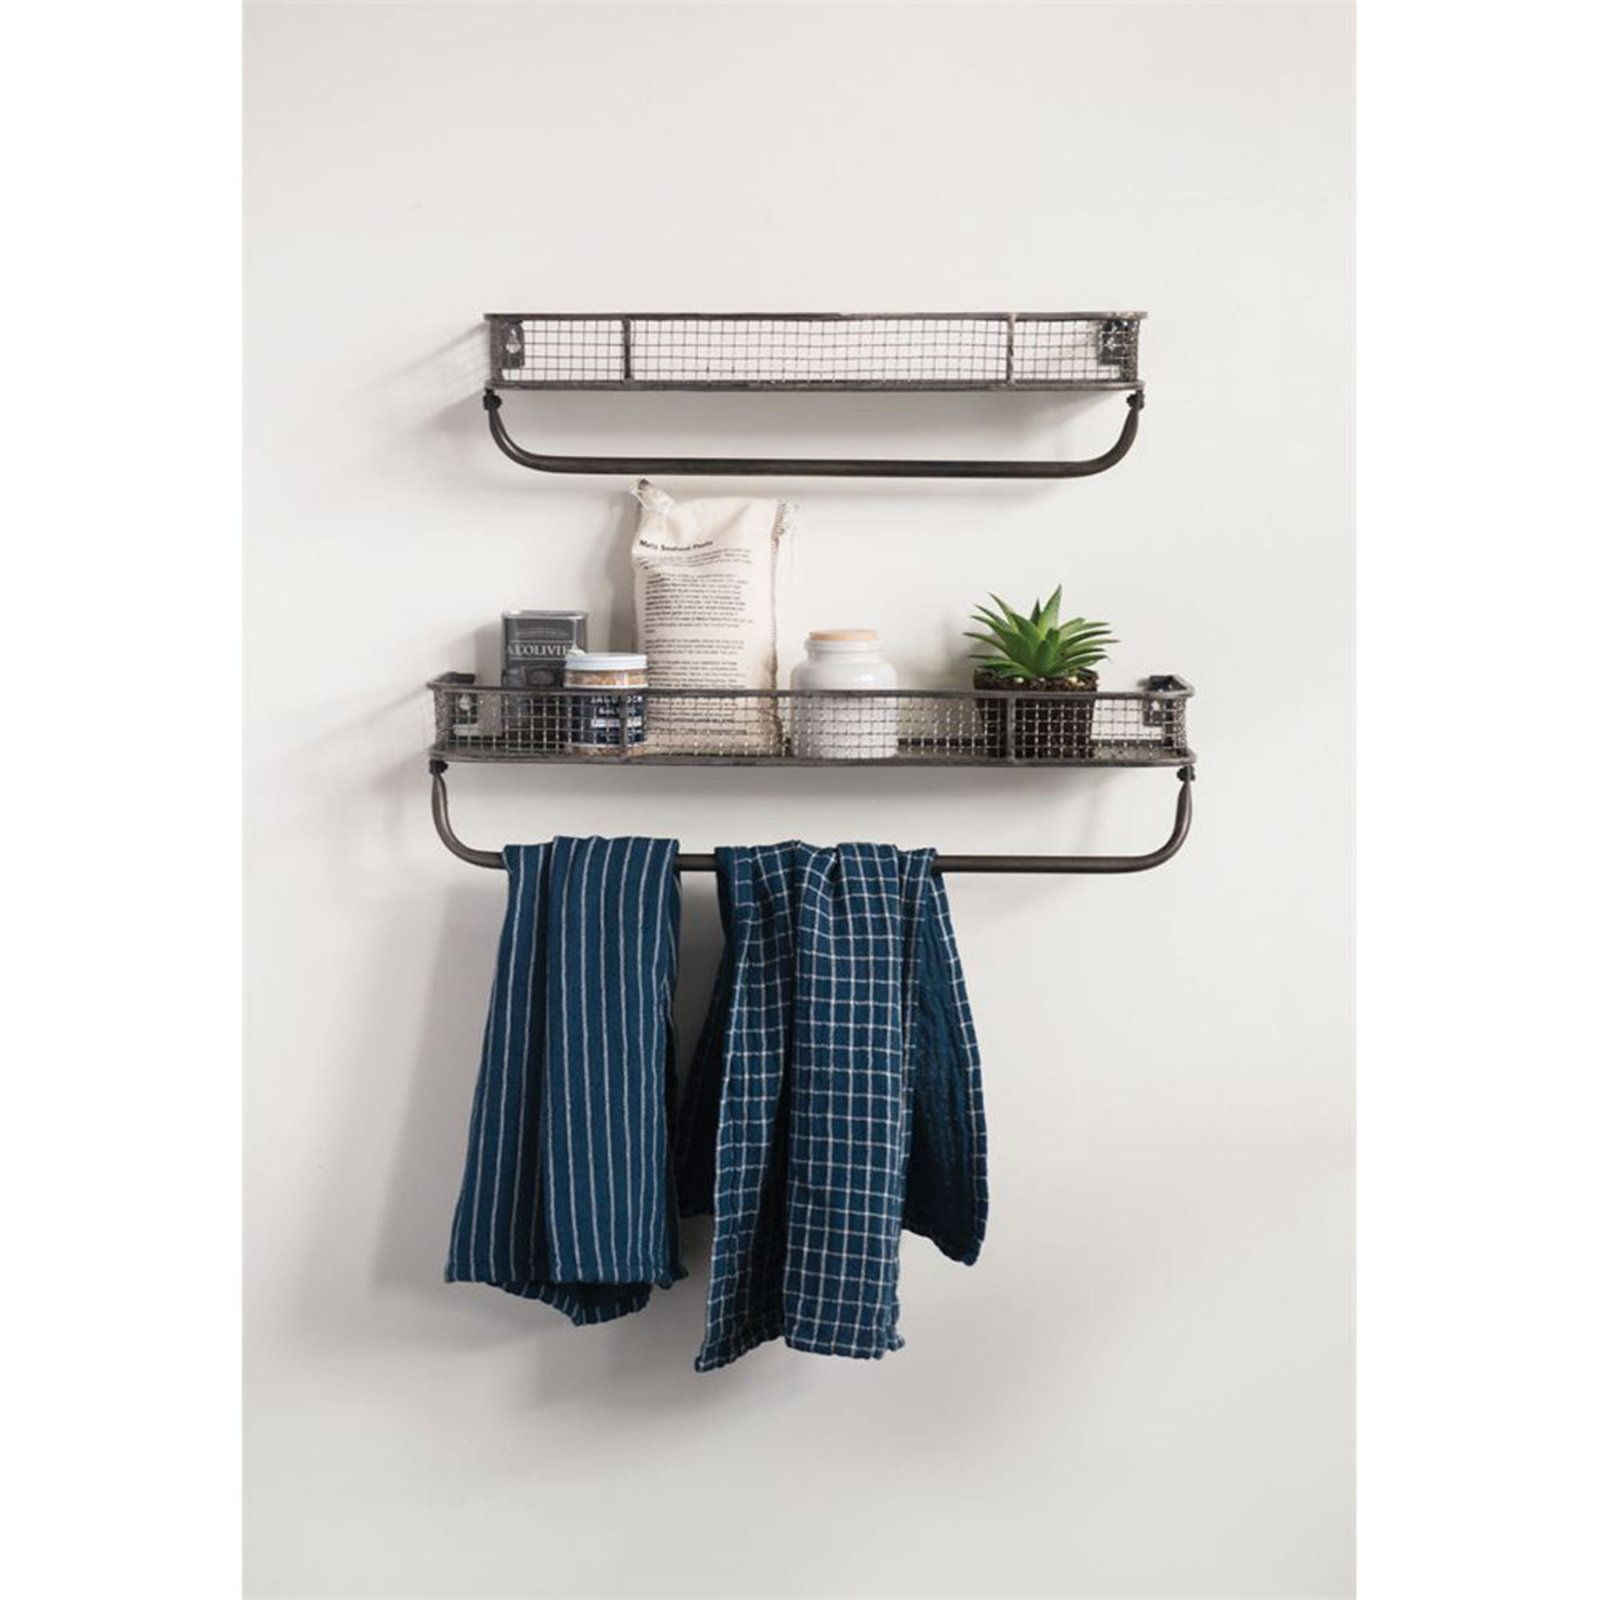 Industrial Grid Shelves Set Of 2 Metal Wall Shelves Bathroom